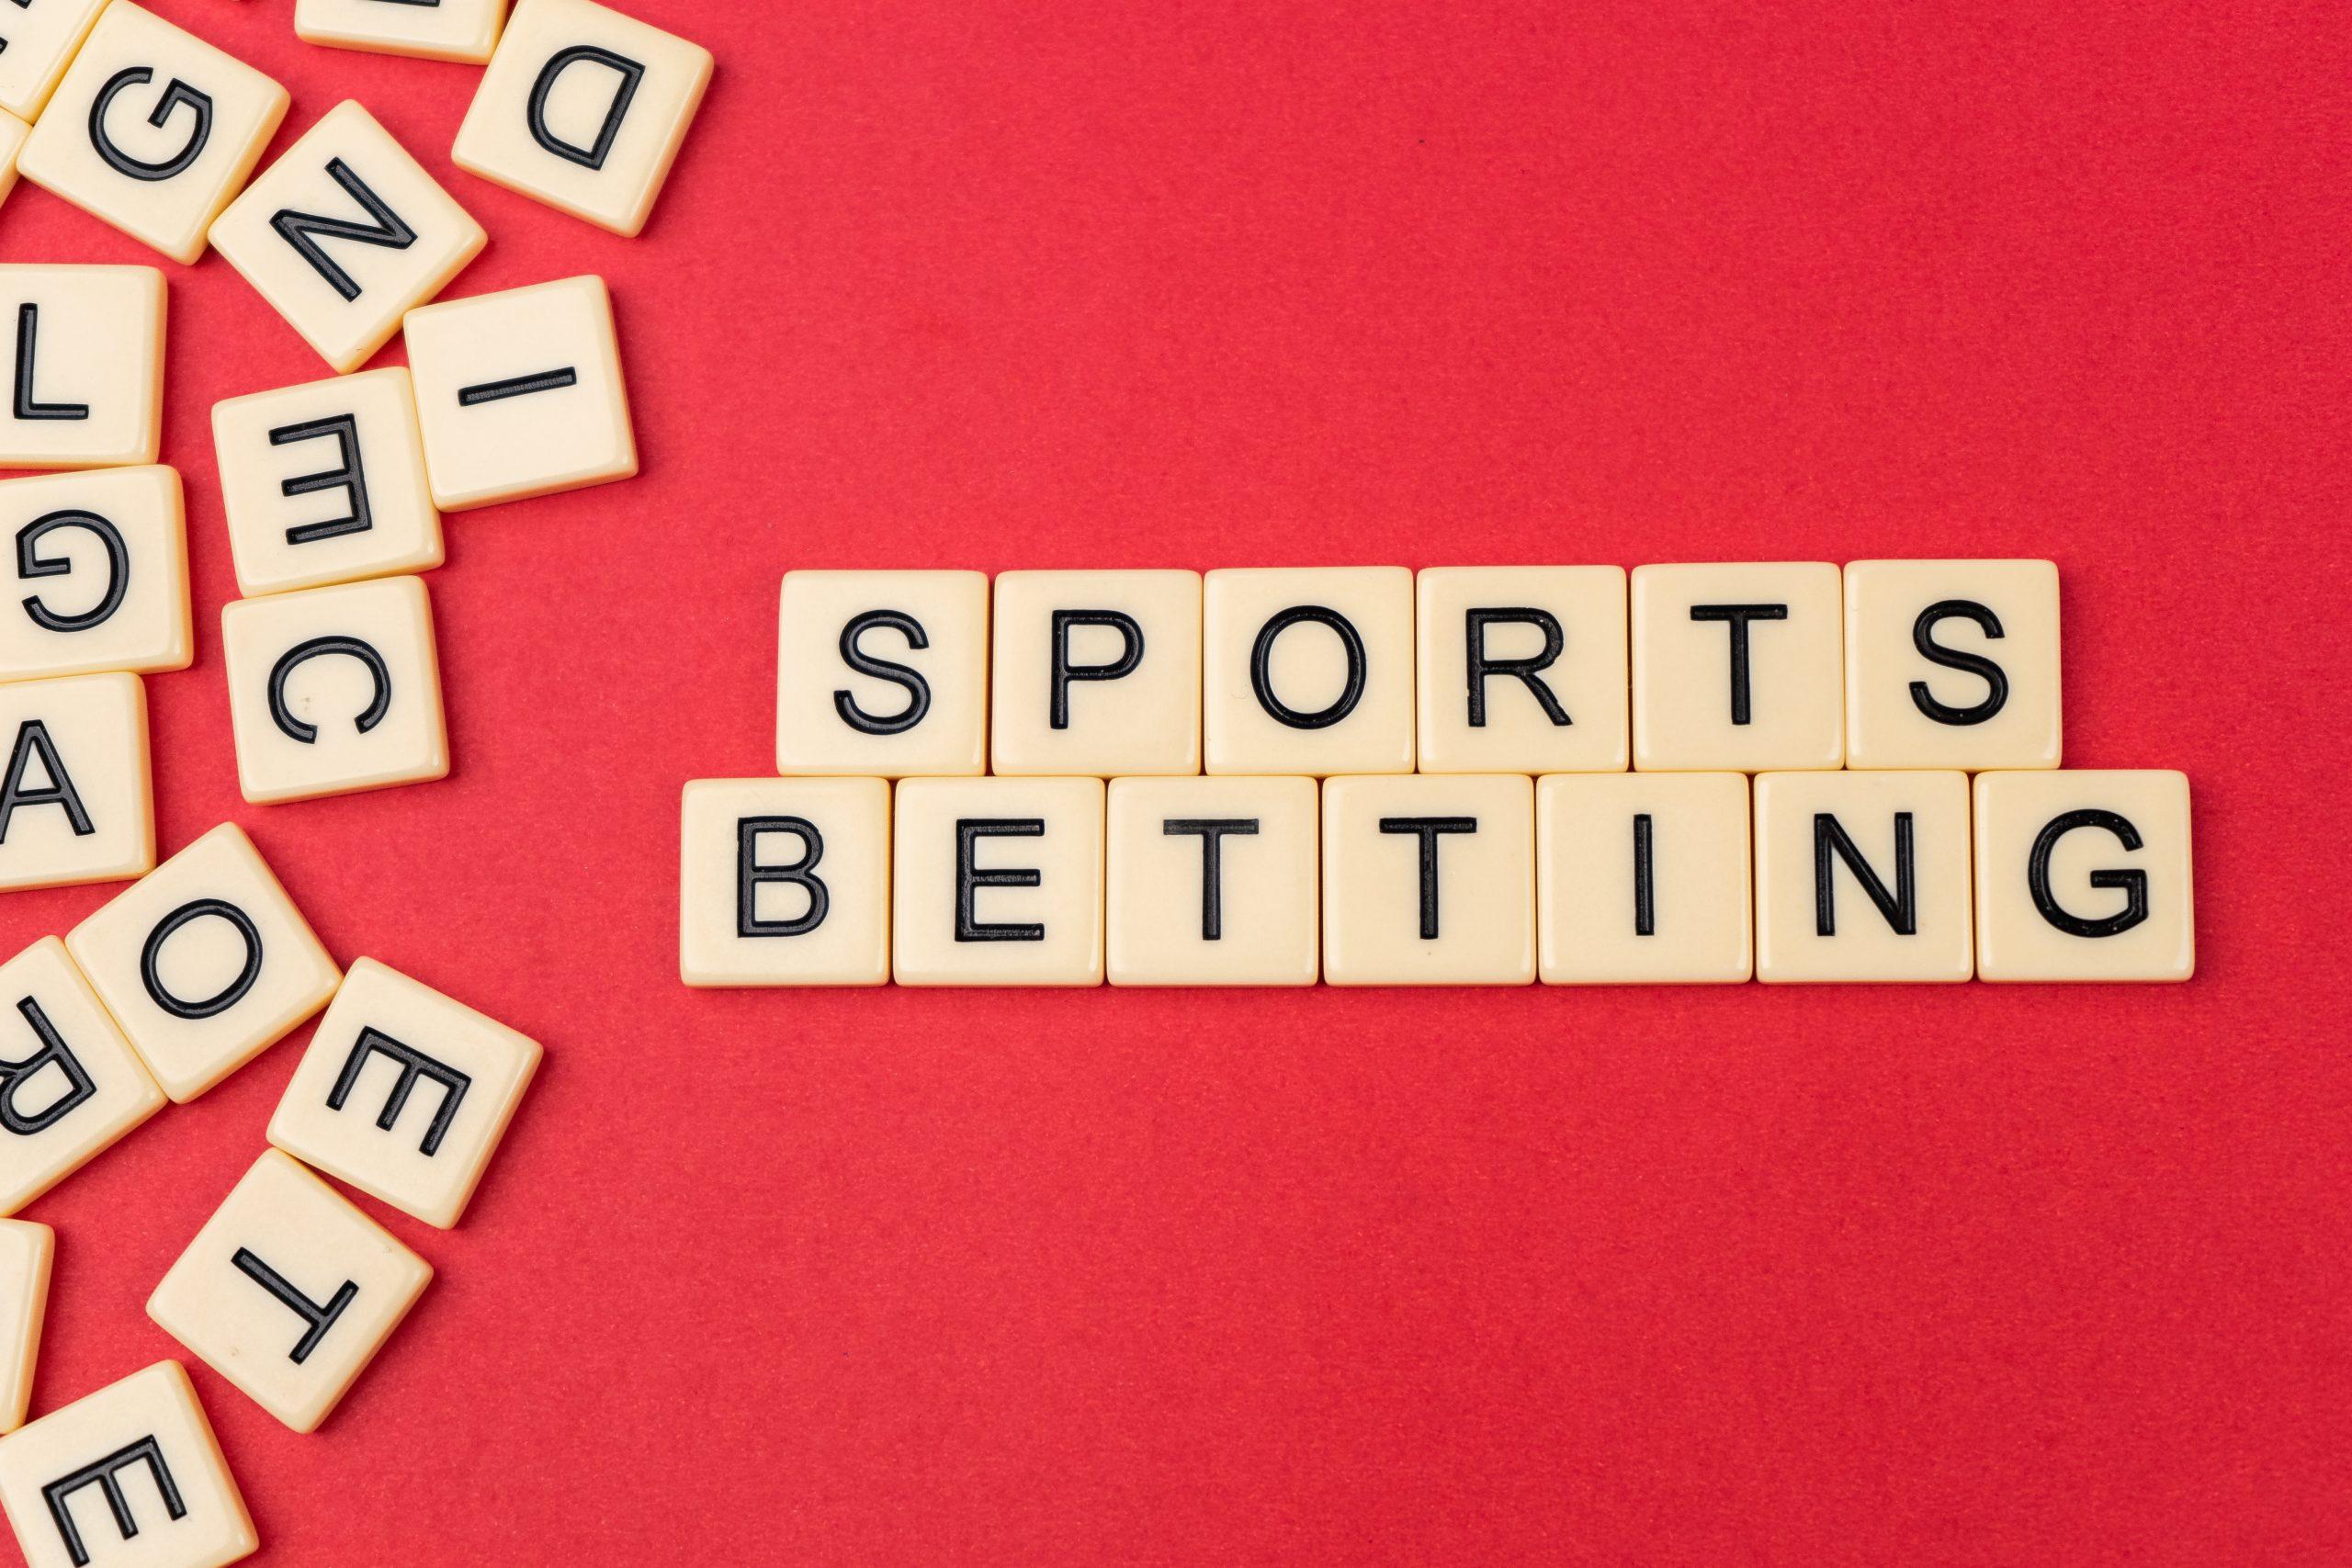 Sports betting written with scrabble